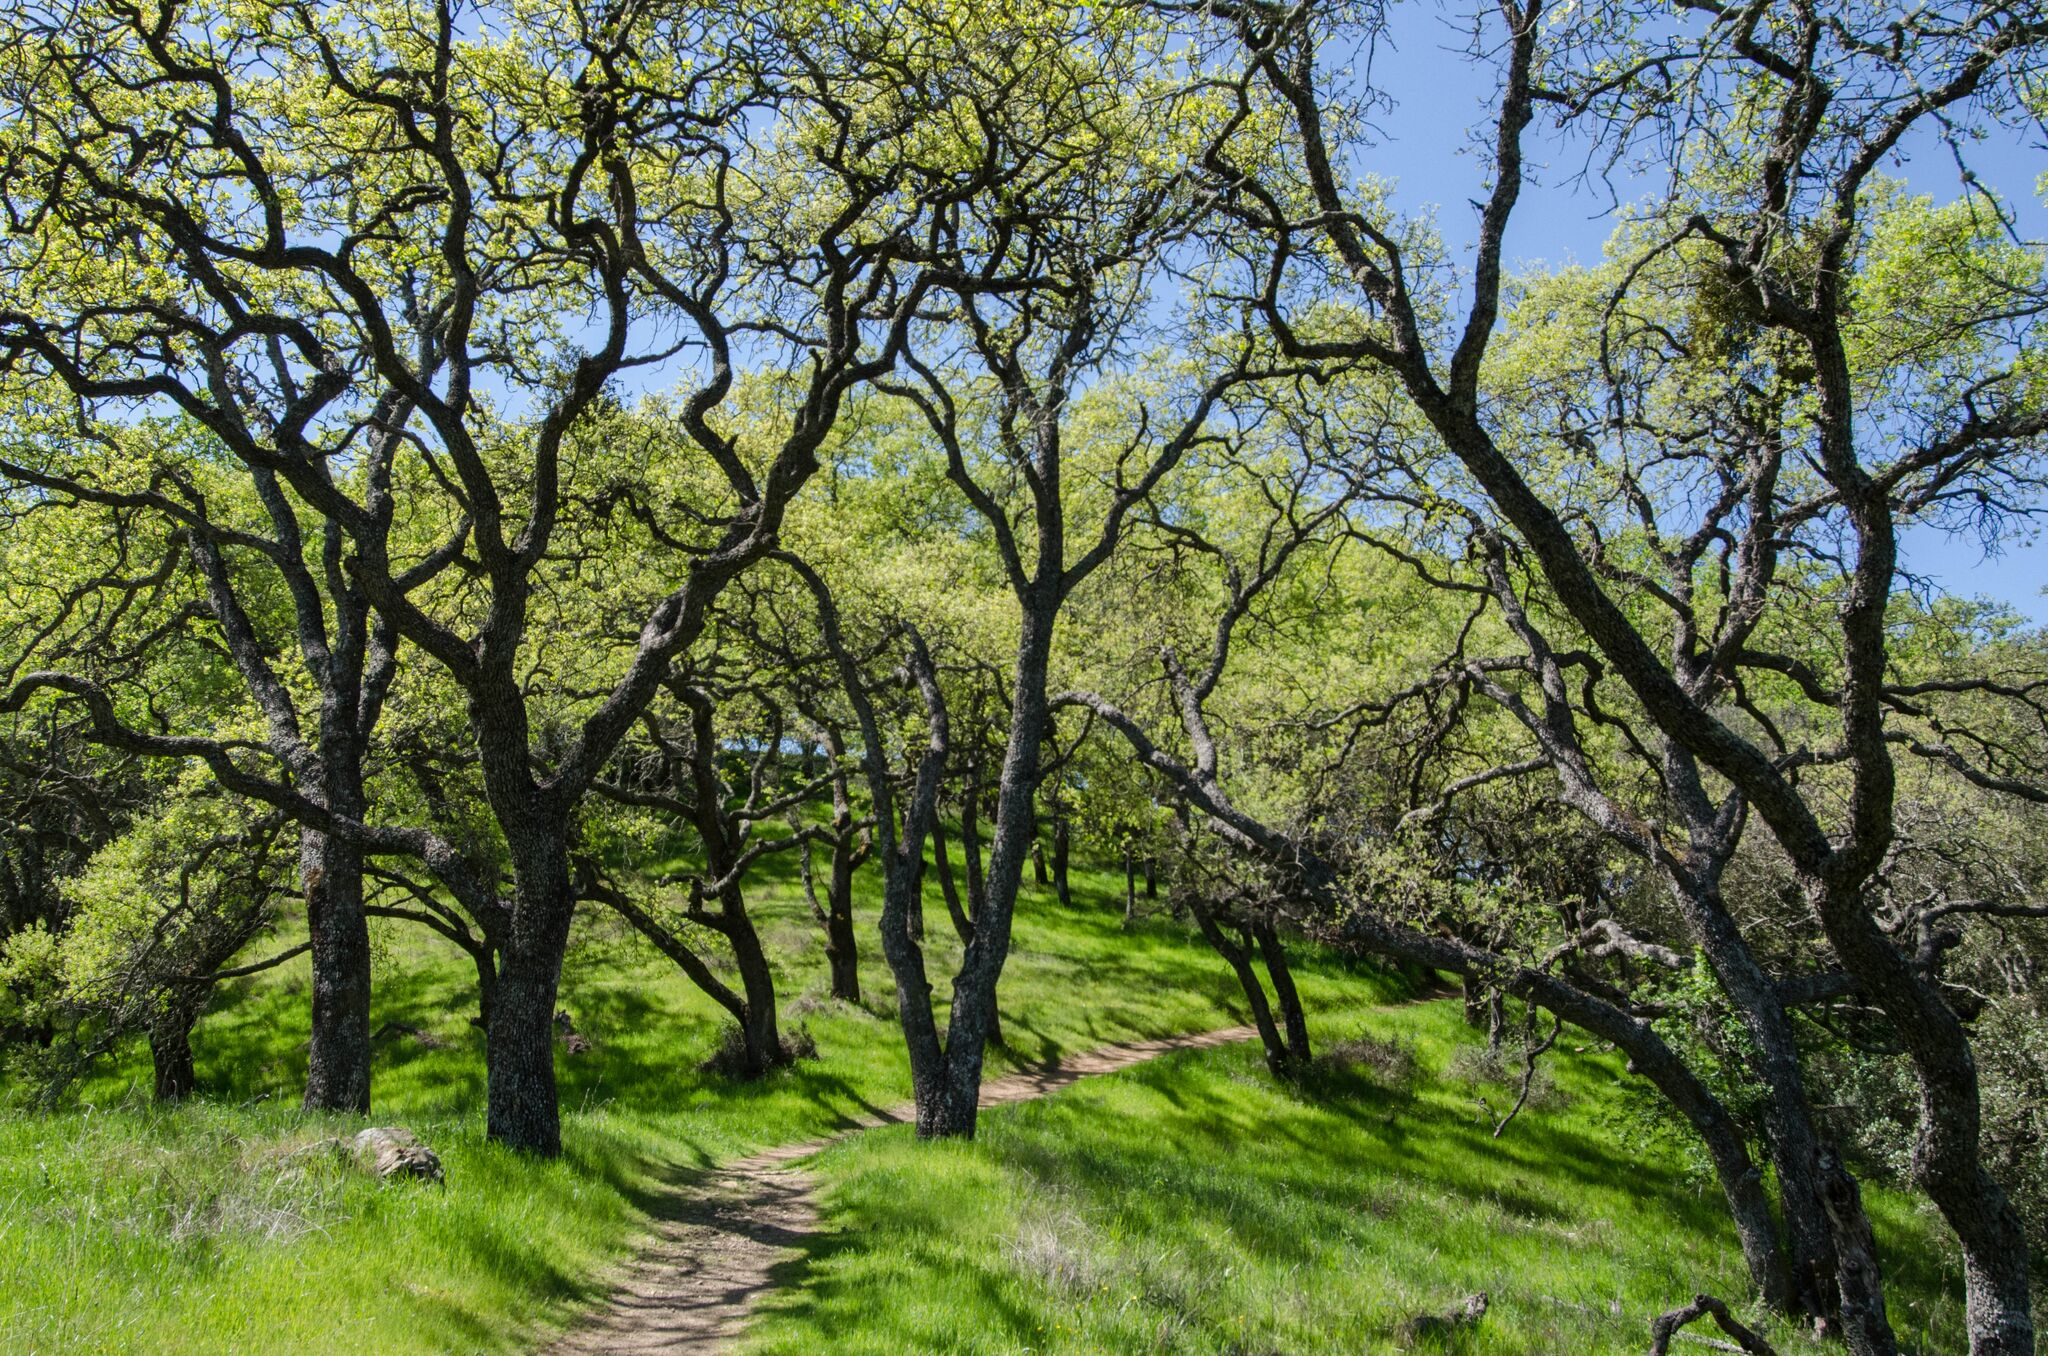 Mayfair-Trail_Rancho-Canada-del-Oro-Open-Space-Preserve_Cassie-Kifer-22_preview